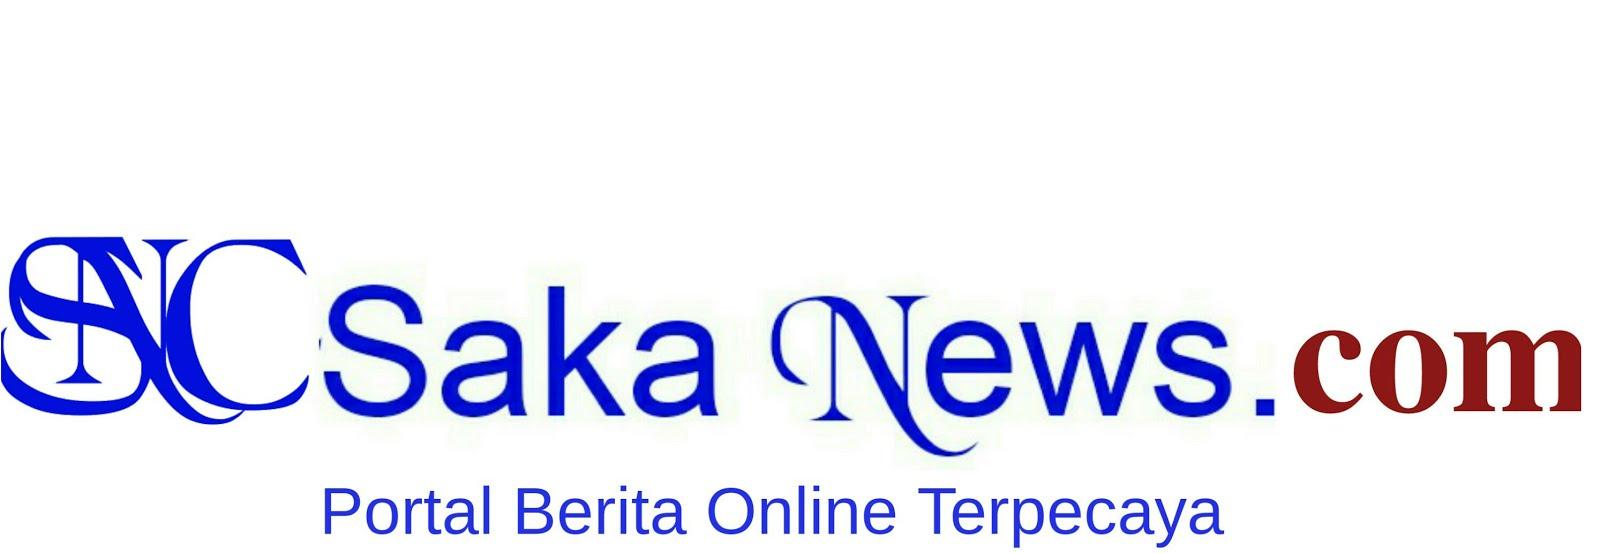 Saka News | Portal Berita Online Terpercaya